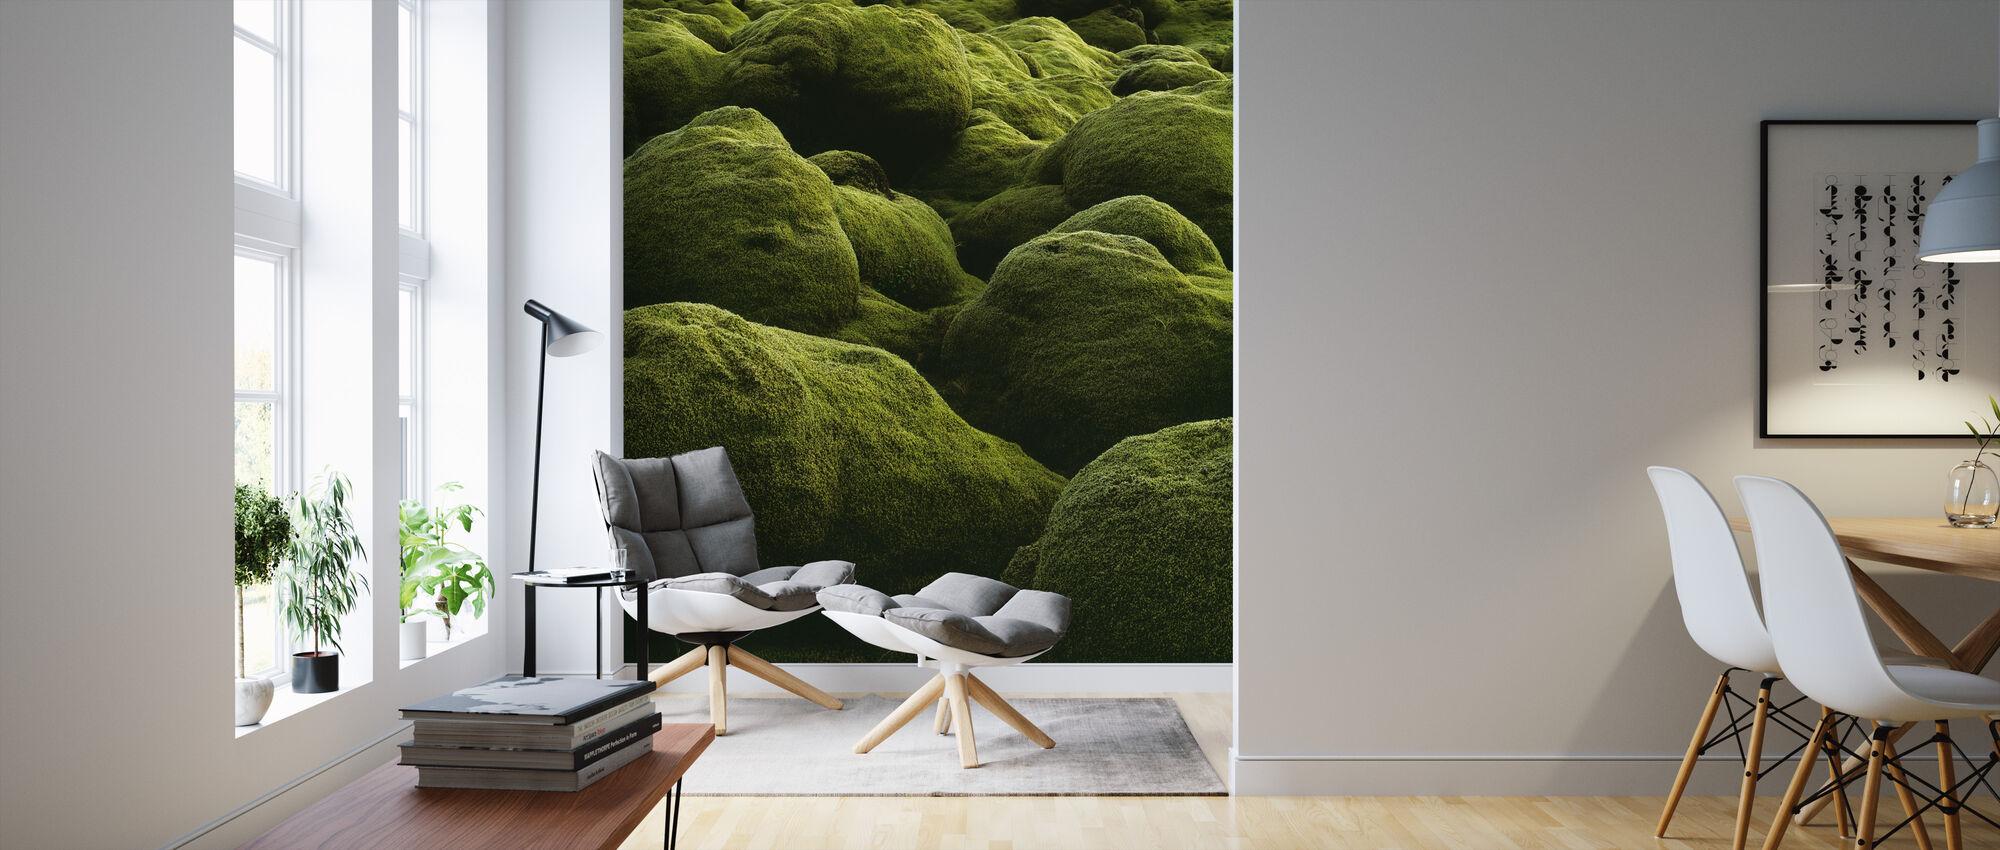 Islannin kivet - Tapetti - Olohuone